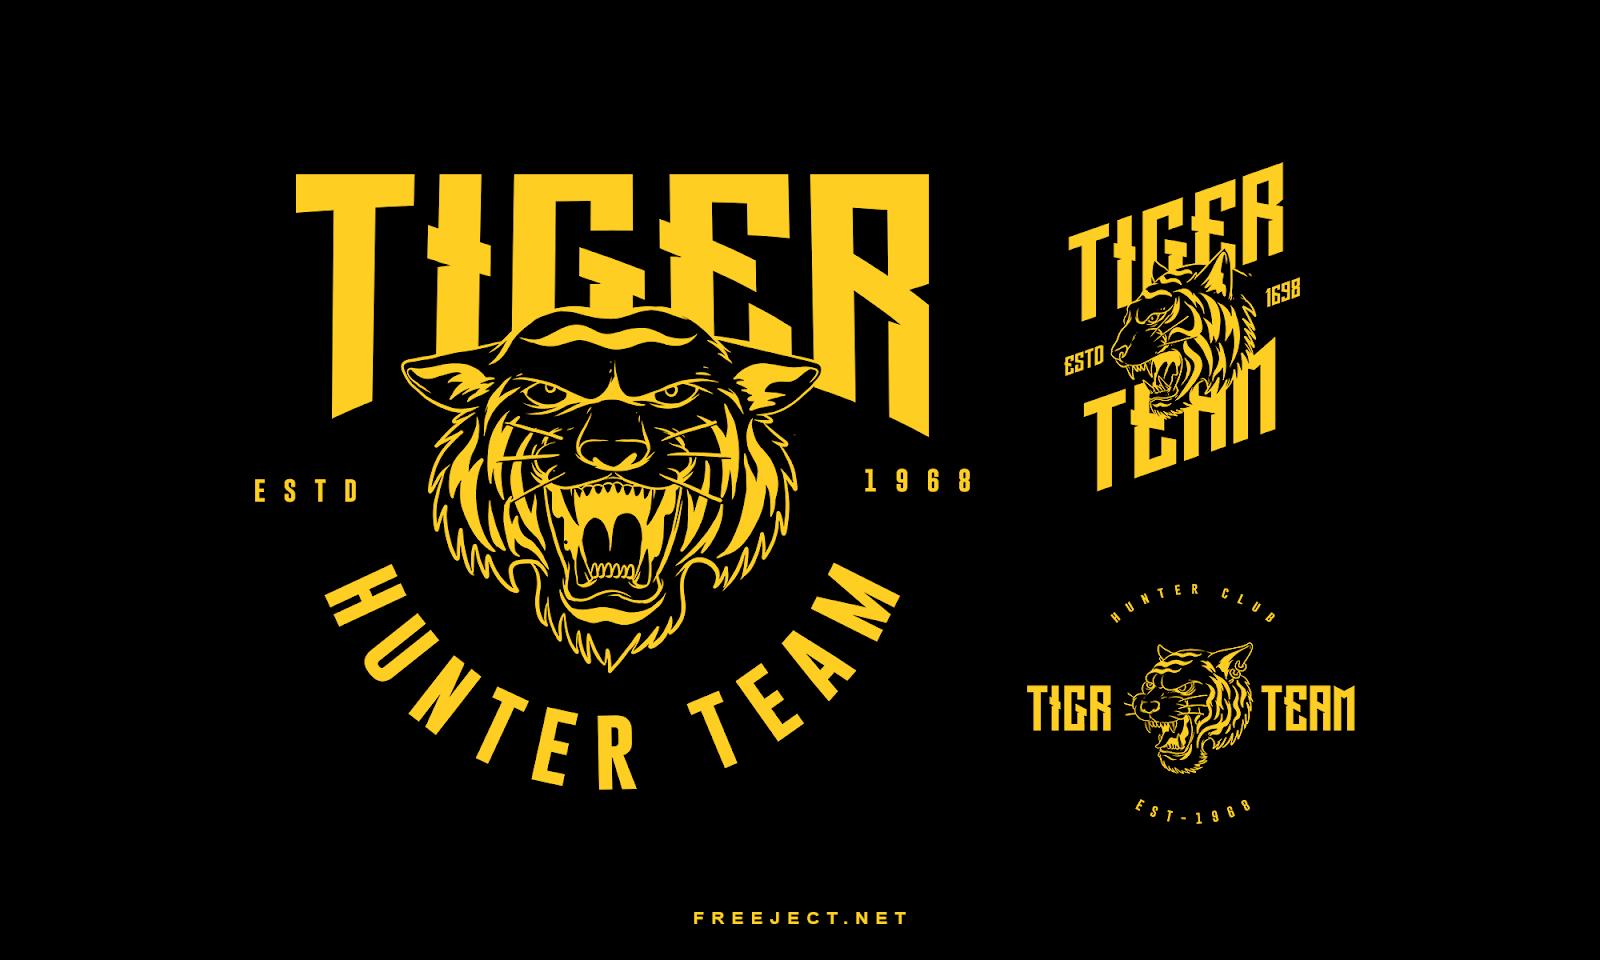 Free Download Tiger Badge Logo Photoshop Template Vol 2 Psd File